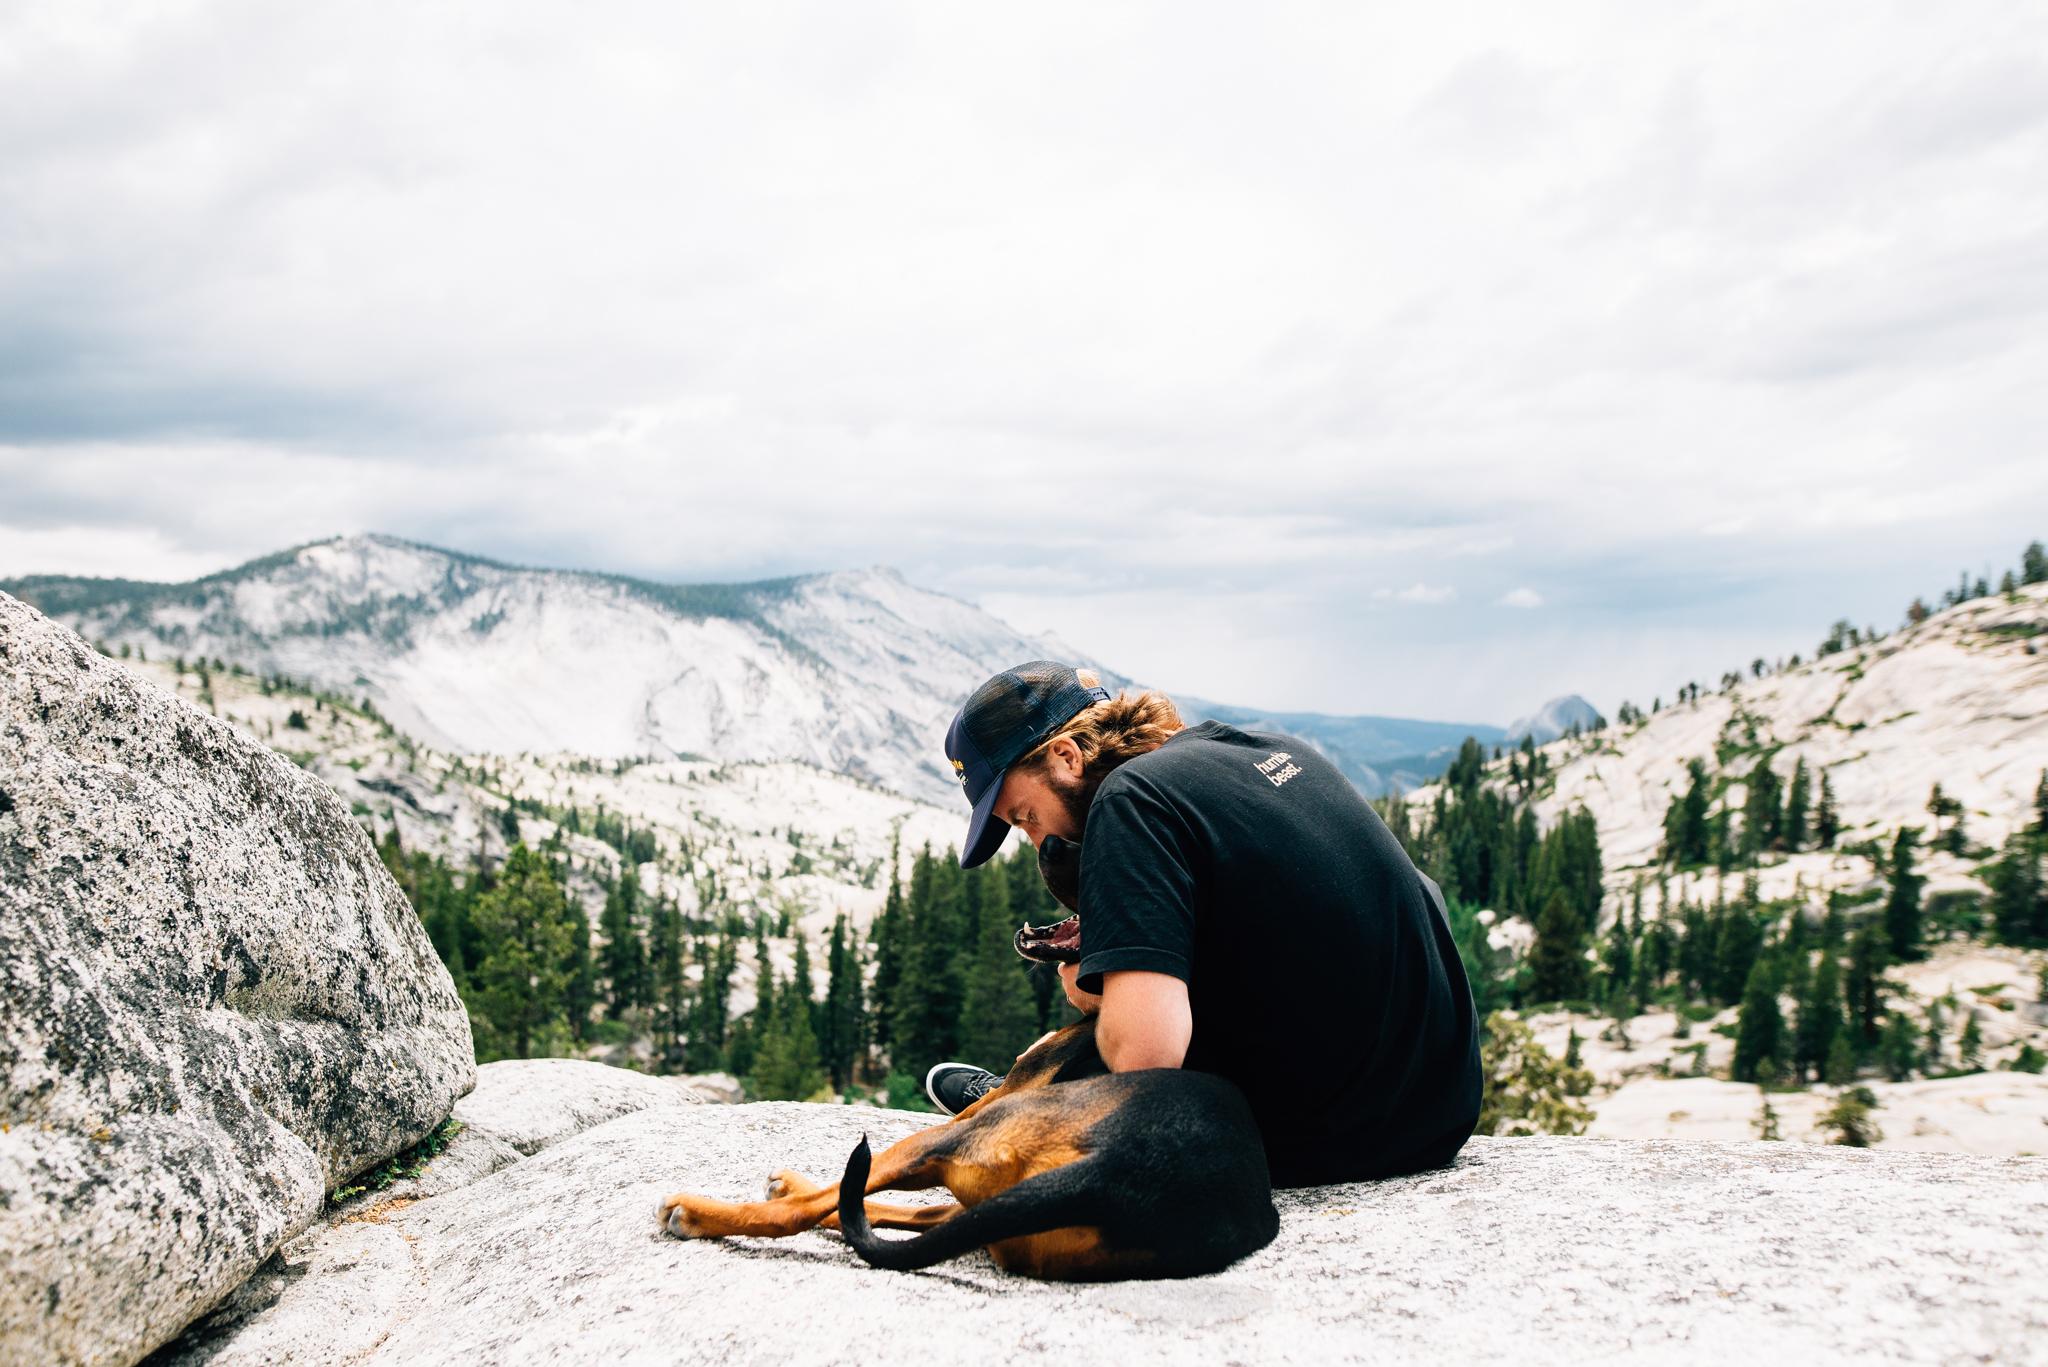 ©The Ryans Photography - Los Angeles Travel - Tuolomne Meadows Yosemite-035.jpg